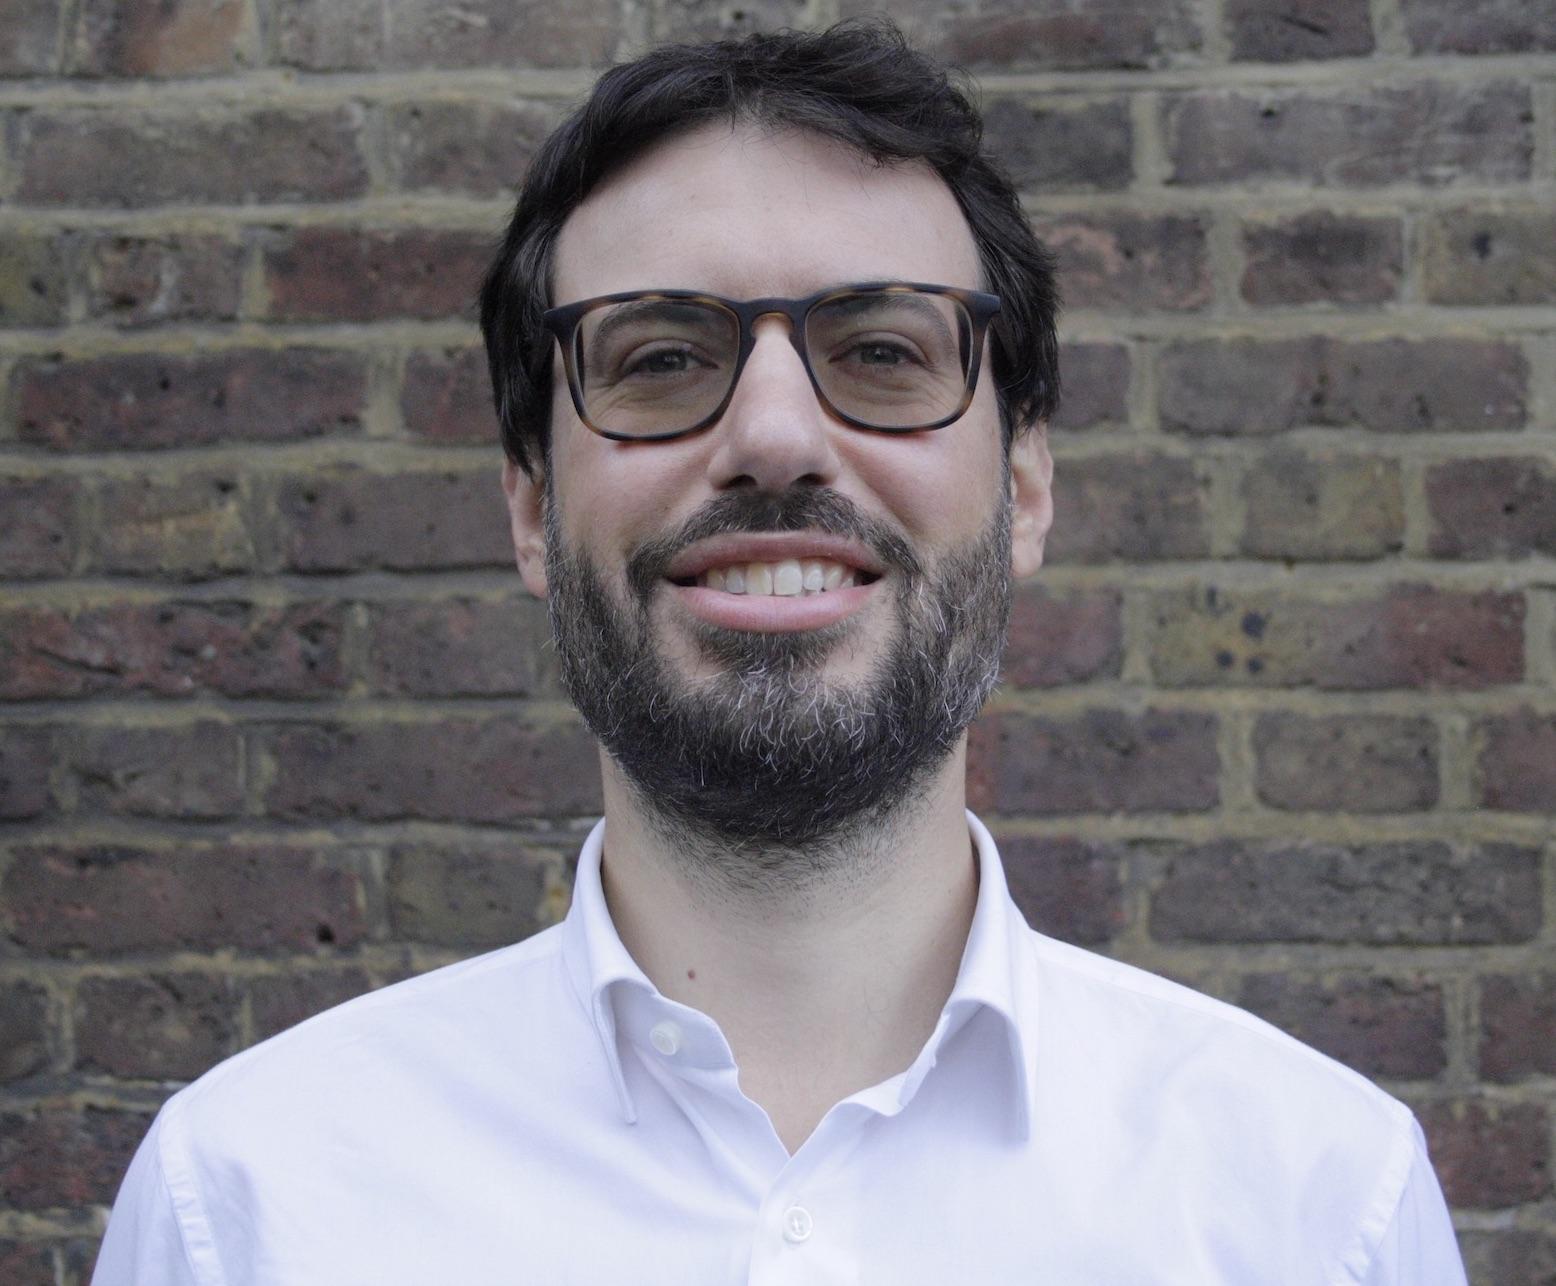 01_Luigi Galimberti, fundador de ARTE PY_websq